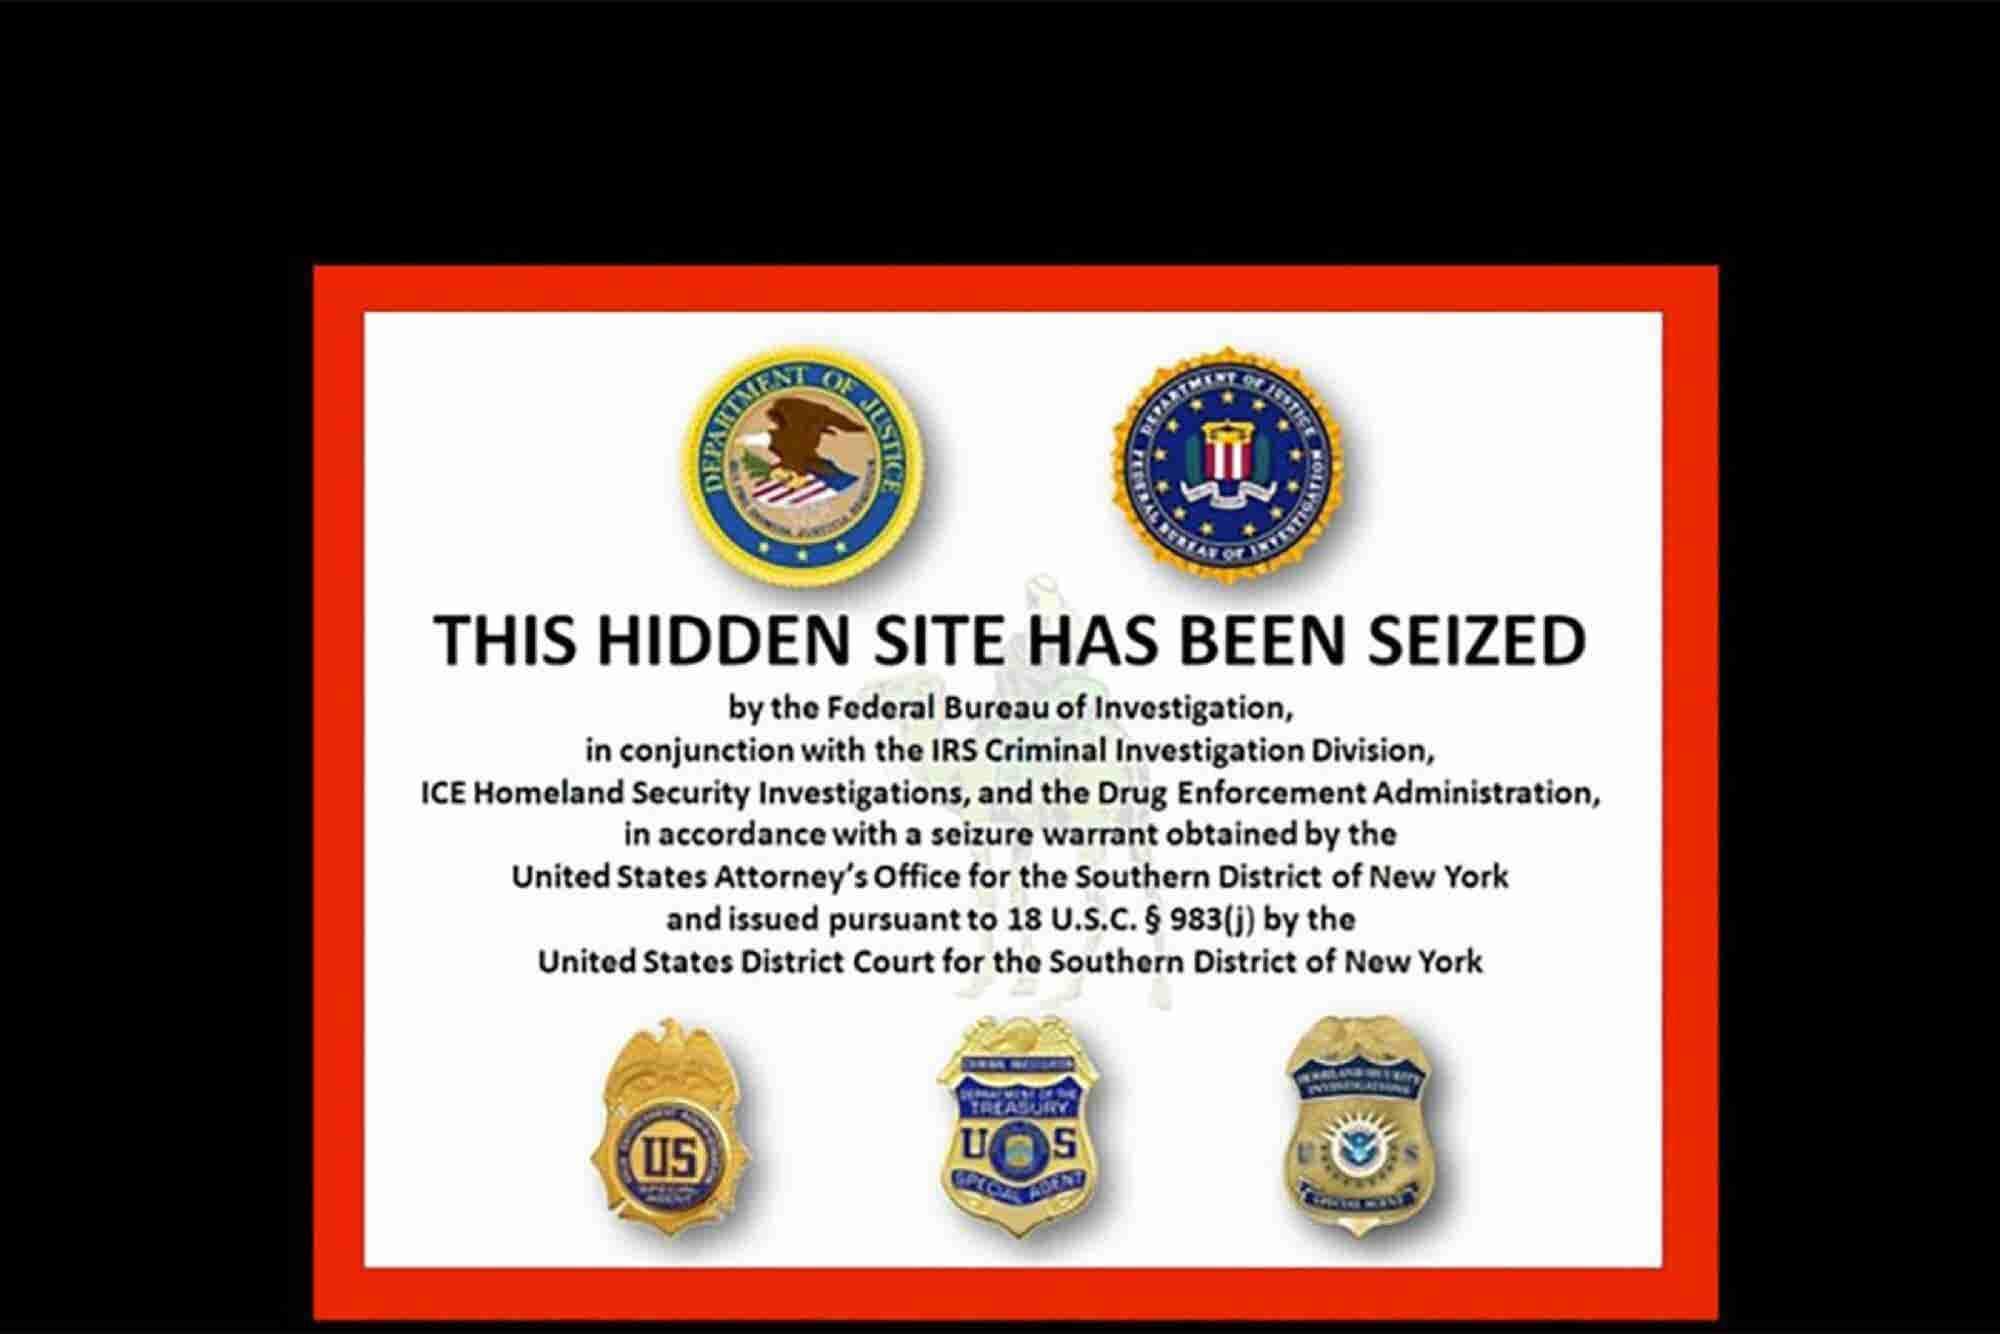 U.S. Shuts Down Silk Road 2.0 Website